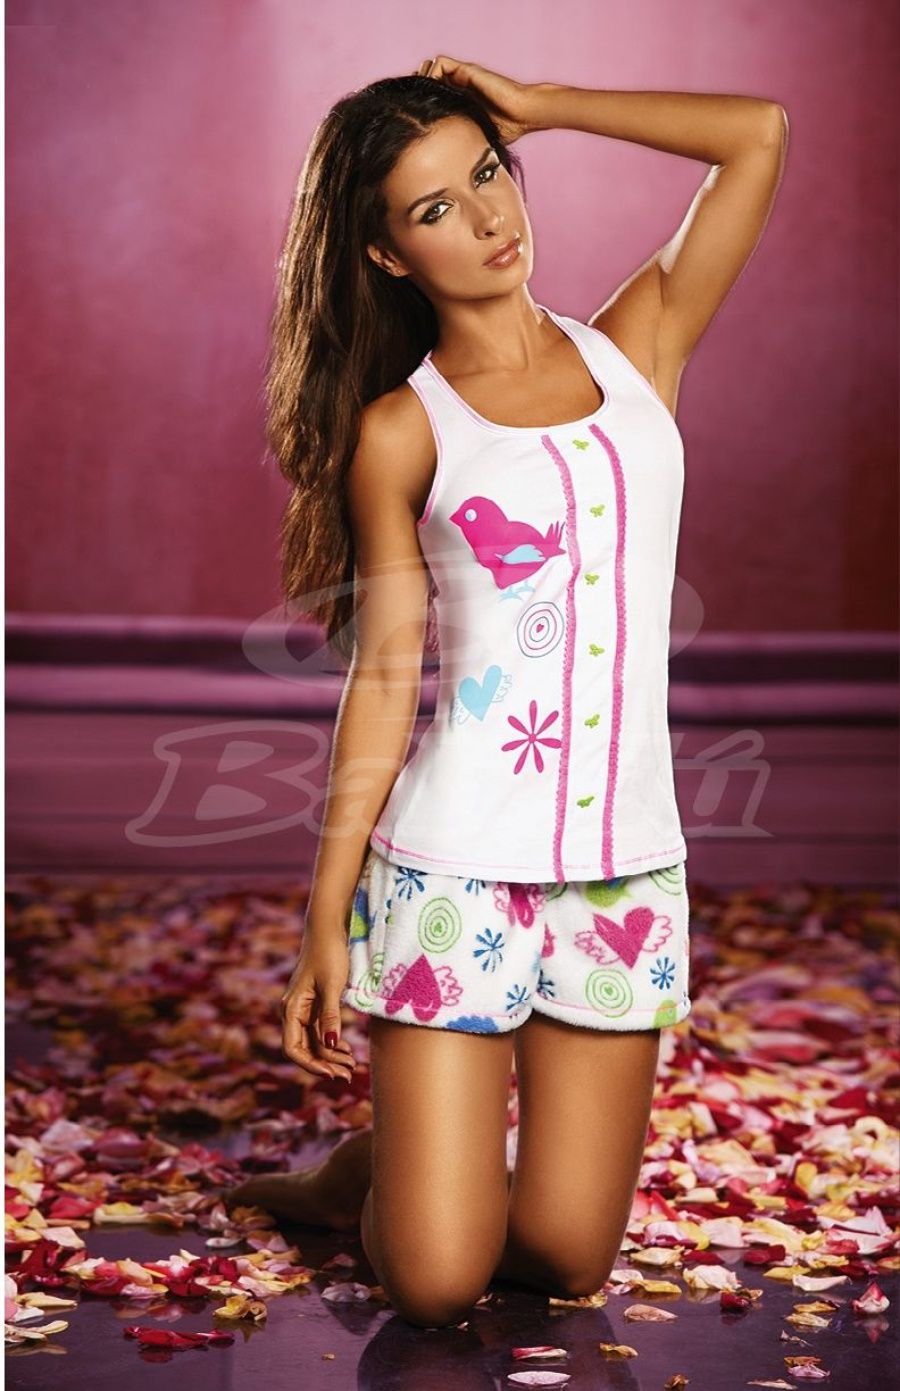 $36000 - Pijama Short Amore  | Moda Femenina Colombiana - http://tiendaonline.modafemenina.com.co/products/pijama-short-amore-8/